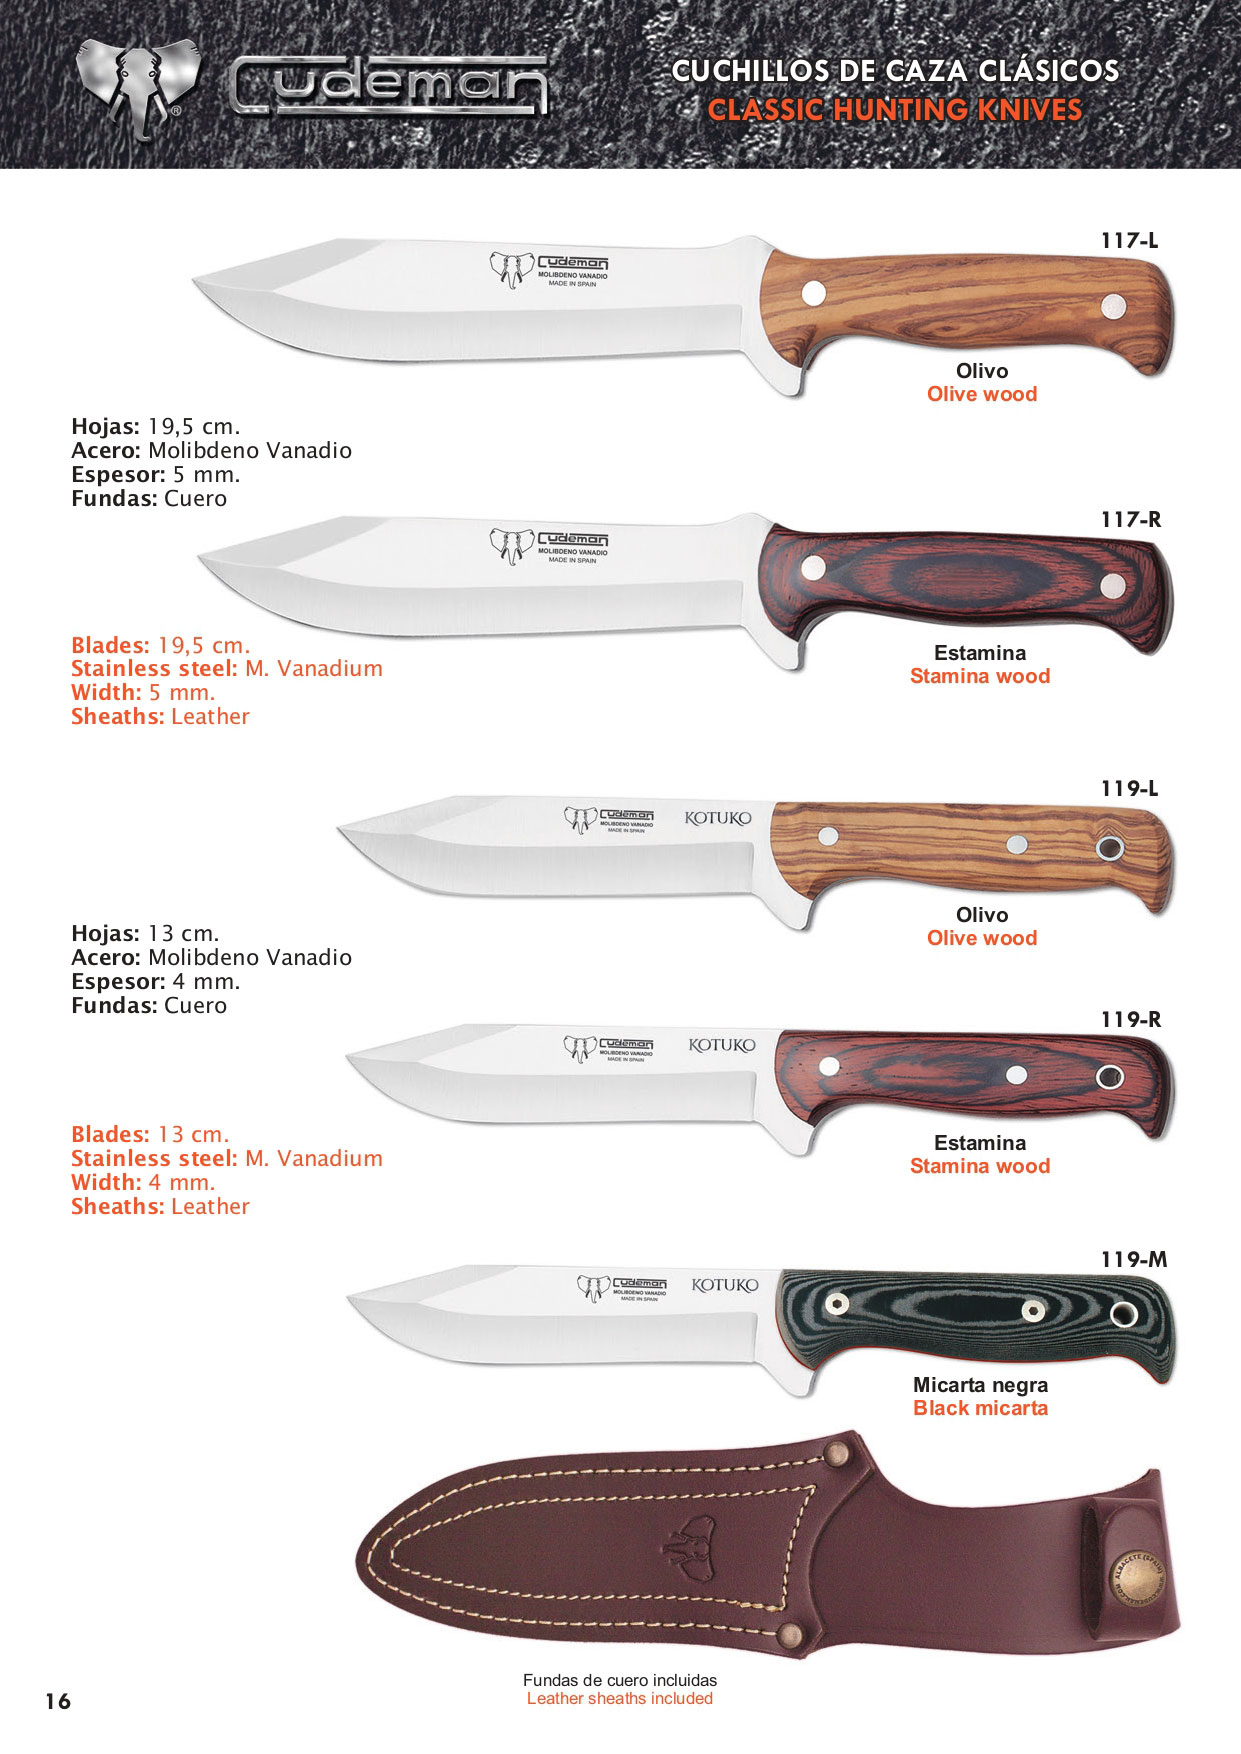 157 r cuchillos de caza 10 cudeman cuchillos tacticos for Clases de cuchillos de mesa